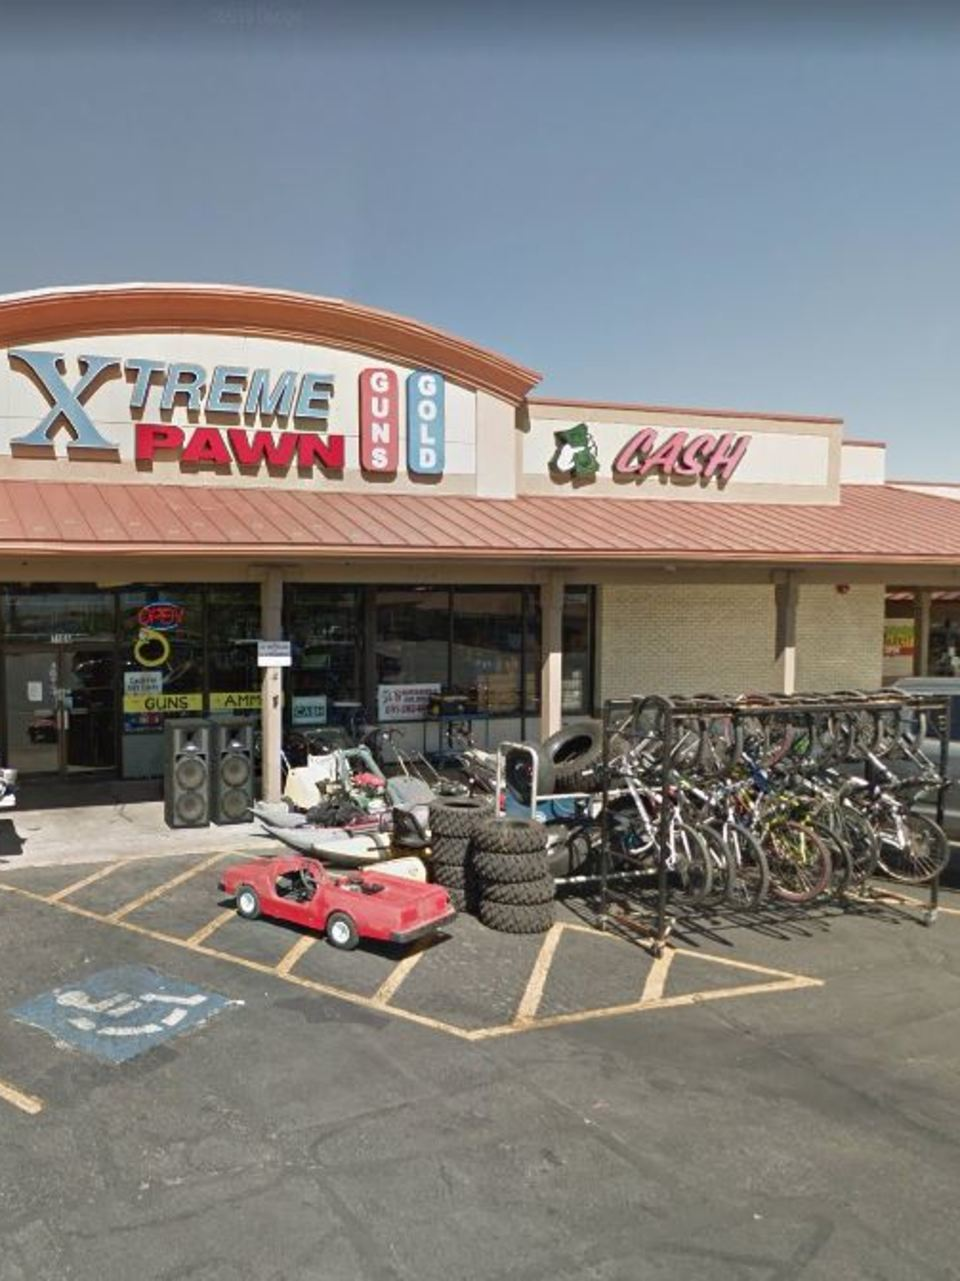 Pawn Shop Fruitridge : fruitridge, 10.2M, Worth, Stolen, Merchandise, Seized, Shop,, Manager, Charged